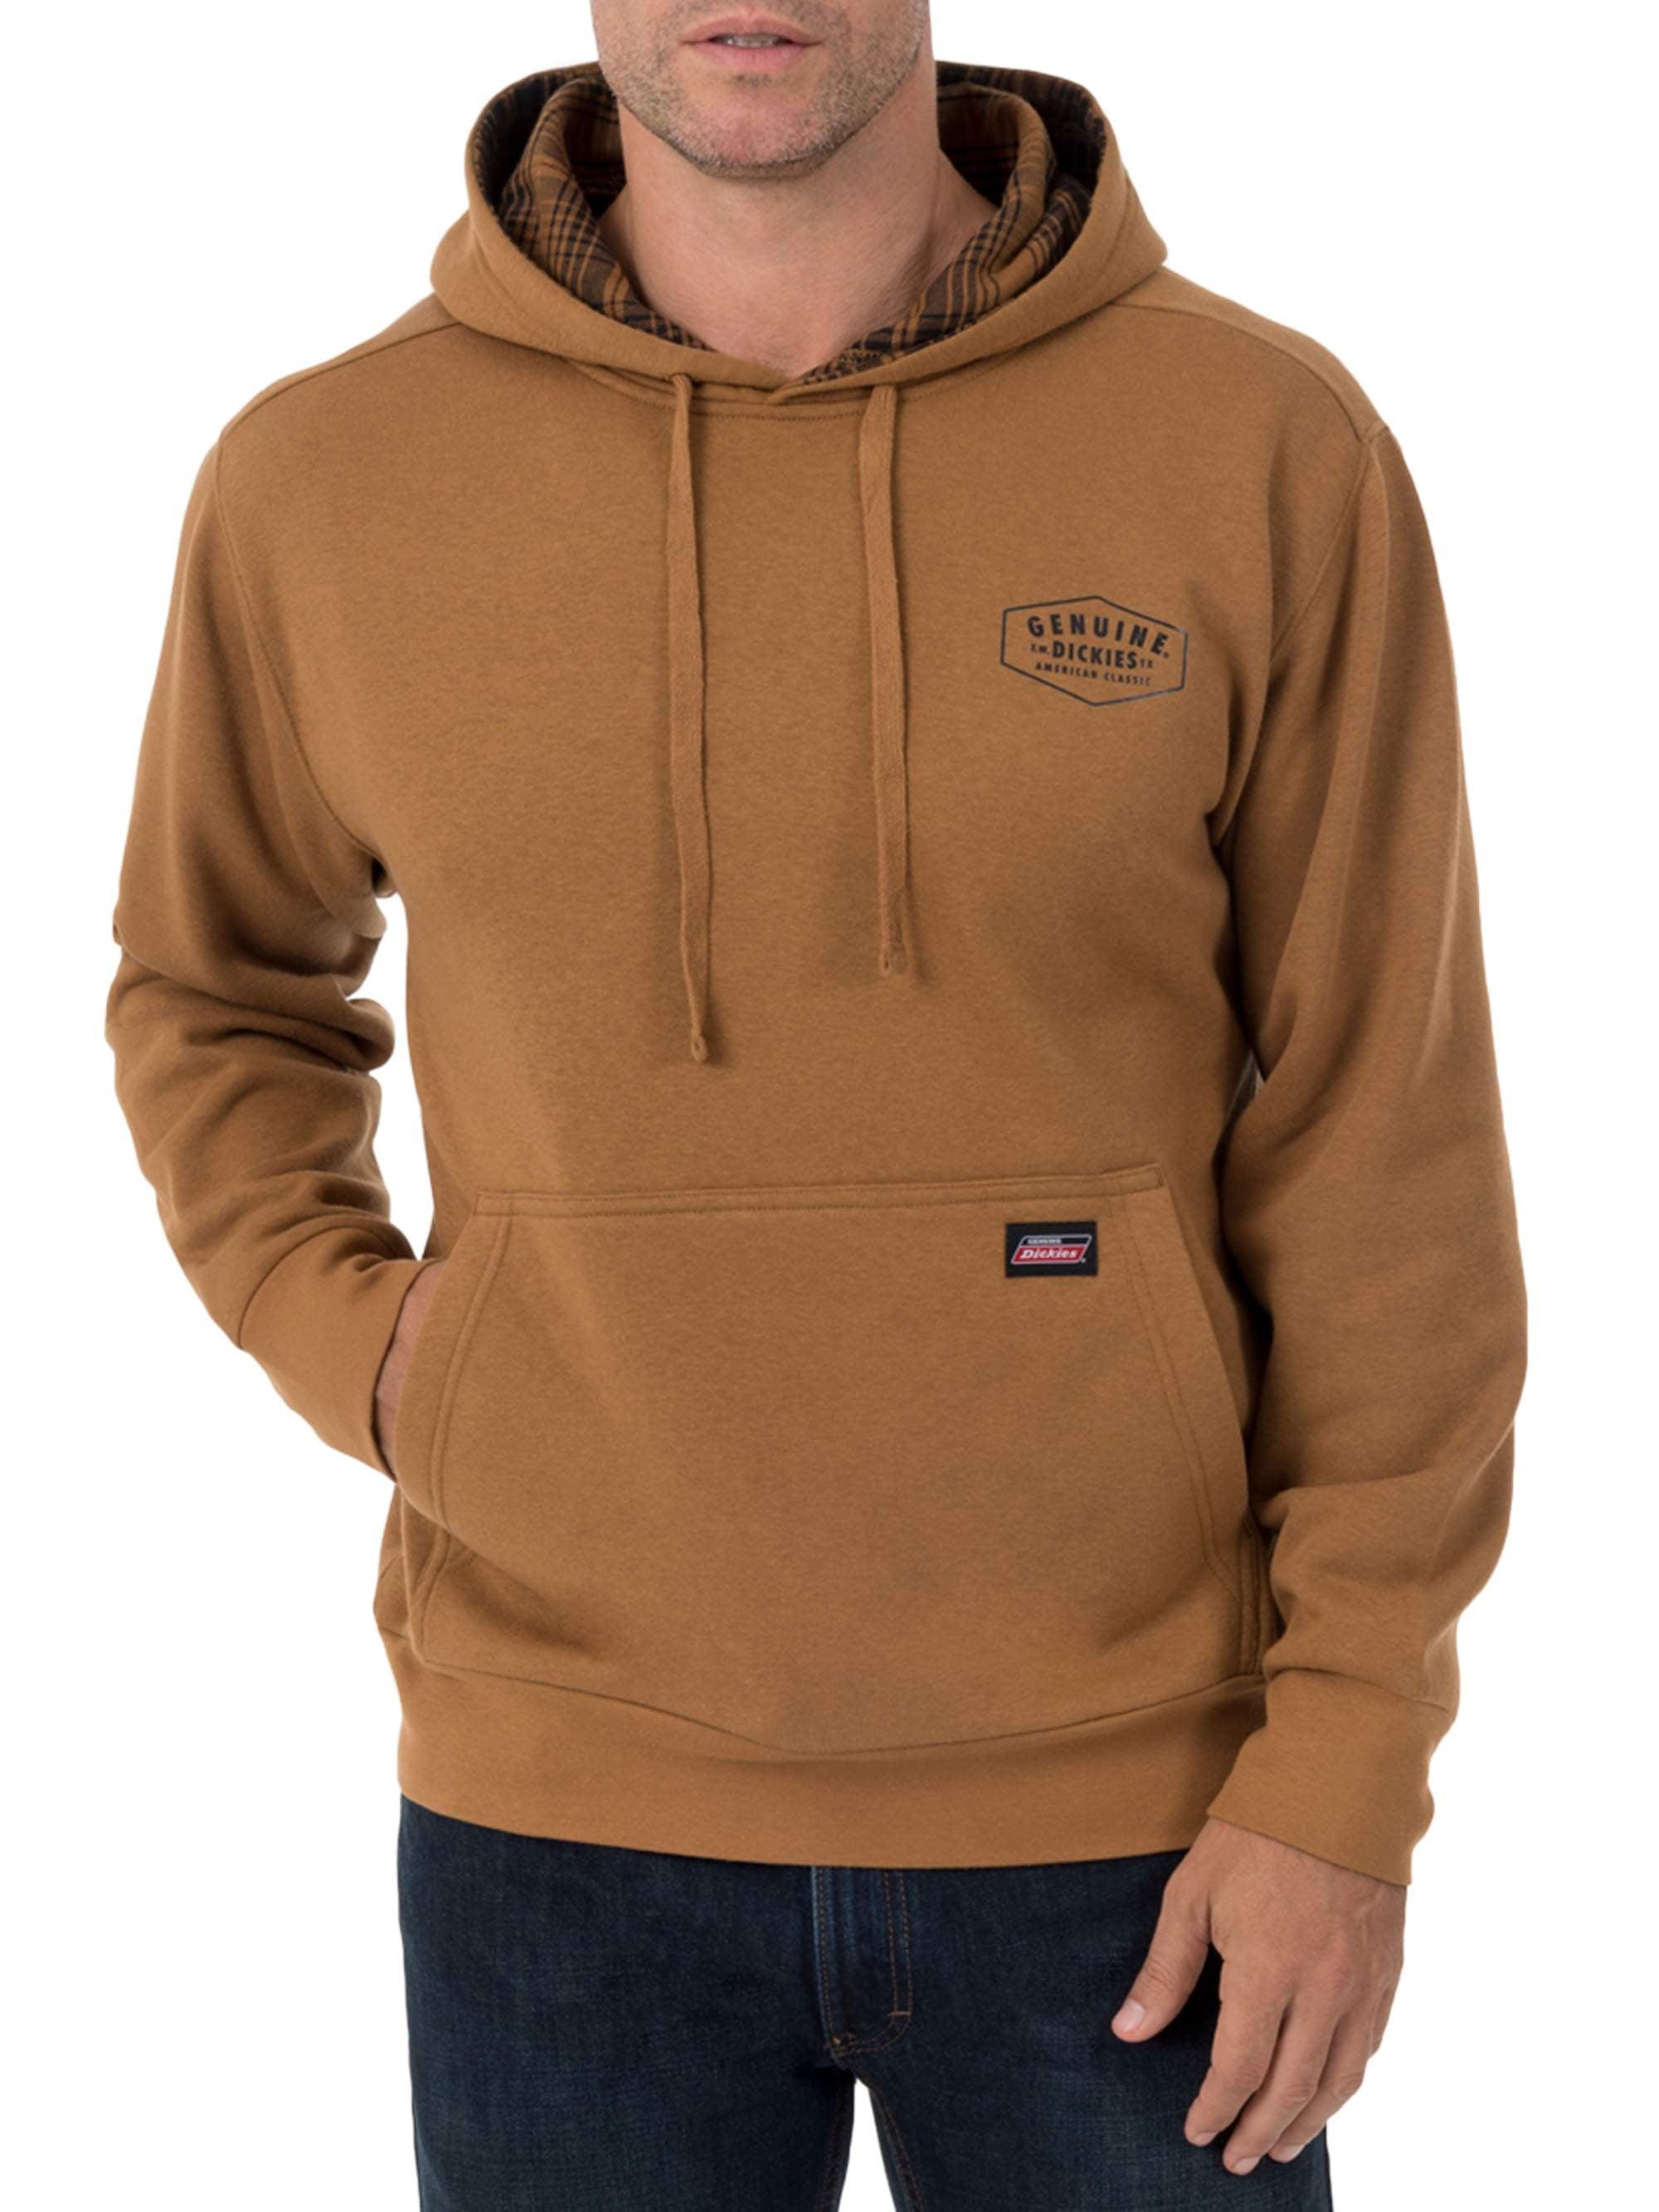 Dickies Men's Fleece Pullover with Flannel Lined Hoodie